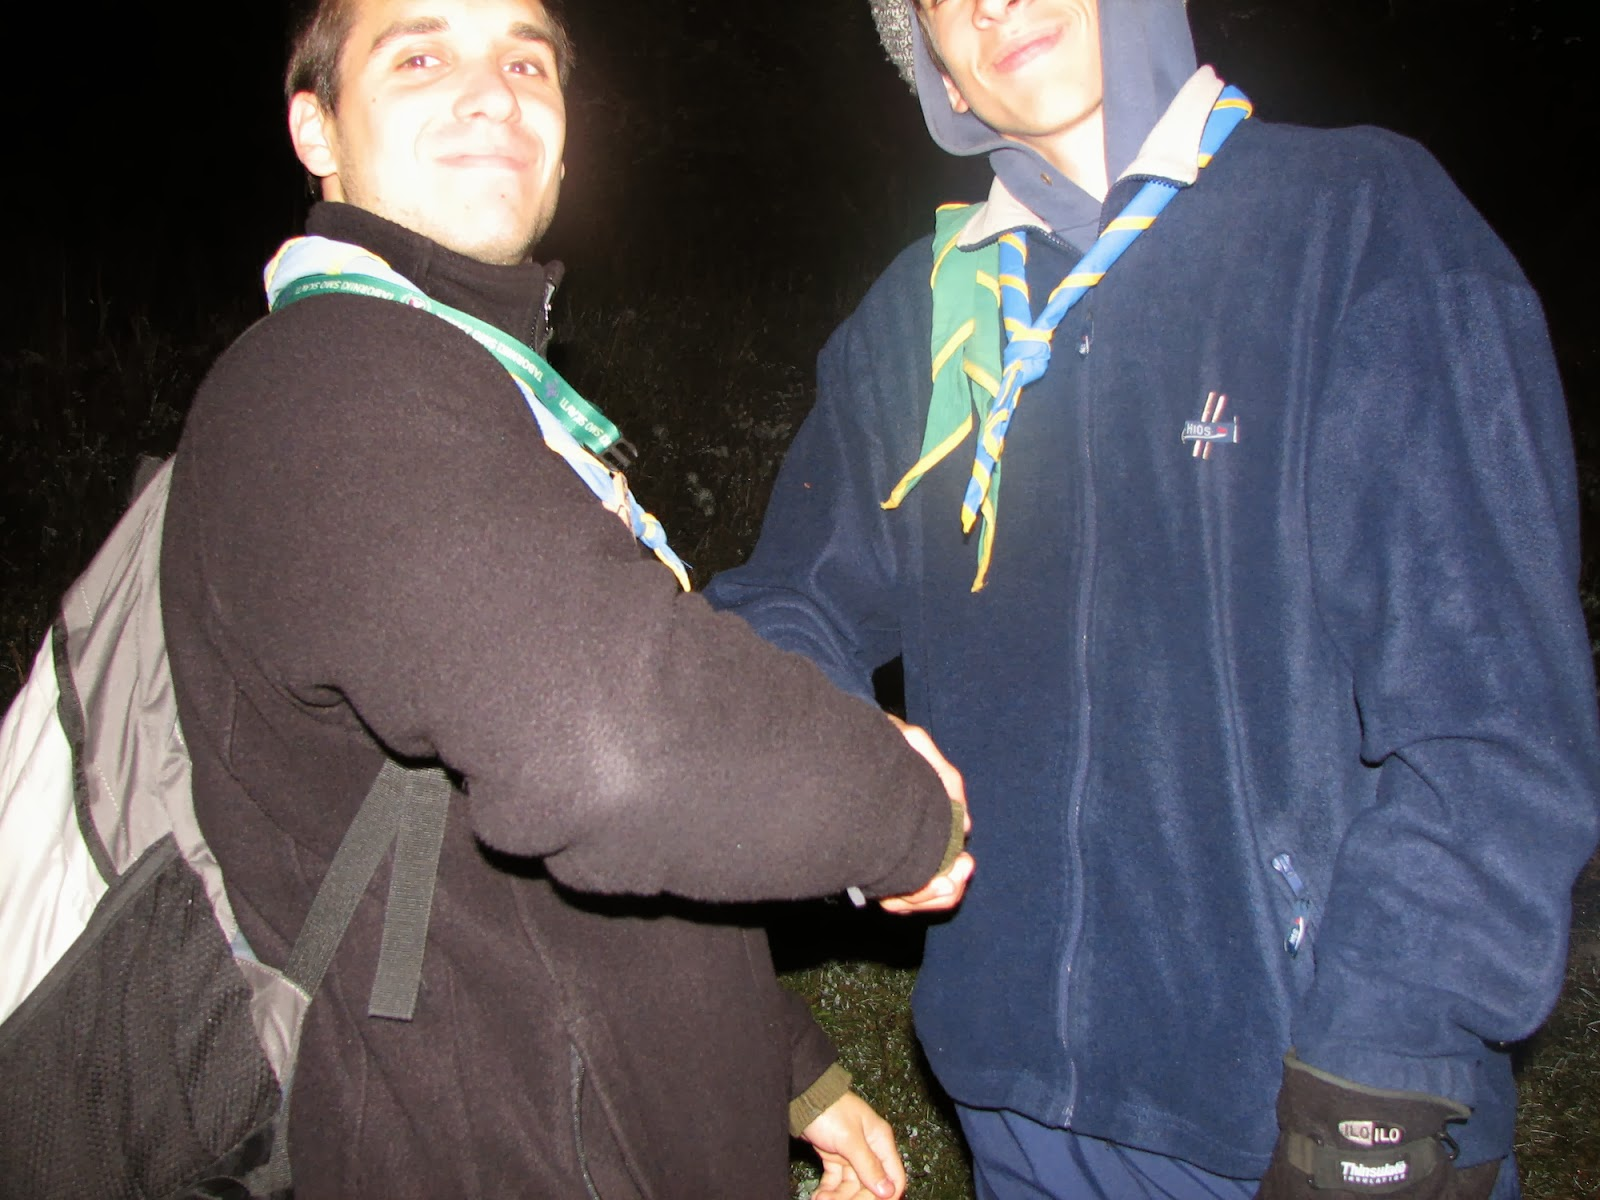 Prehod PP, Ilirska Bistrica 2005 - picture%2B079.jpg